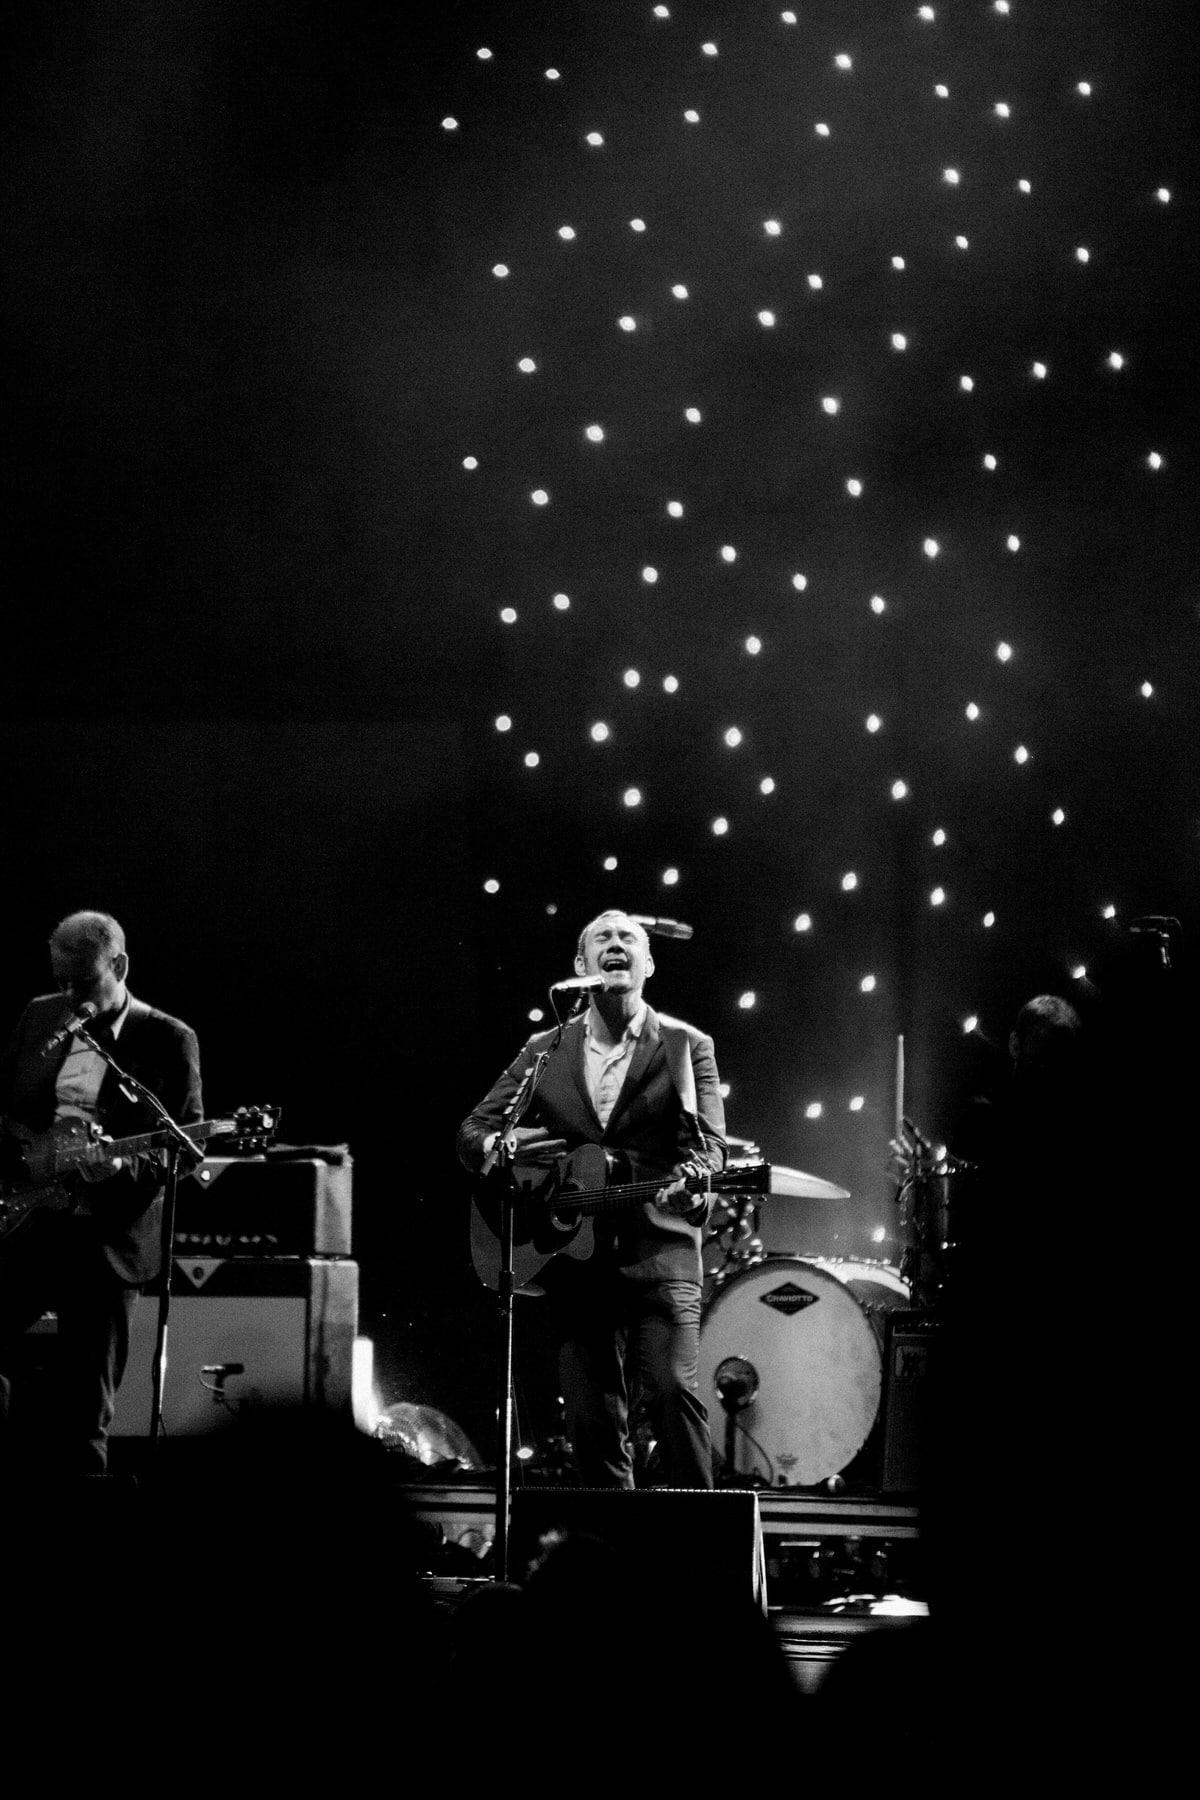 David-Gray-Ray-LaMontagne-concert-Jay-Pritzker-Paviilion-Chicago-Illinois-black-and-white-fine-art-photography-by-Studio-L-photographer-Laura-Schneider-_3703